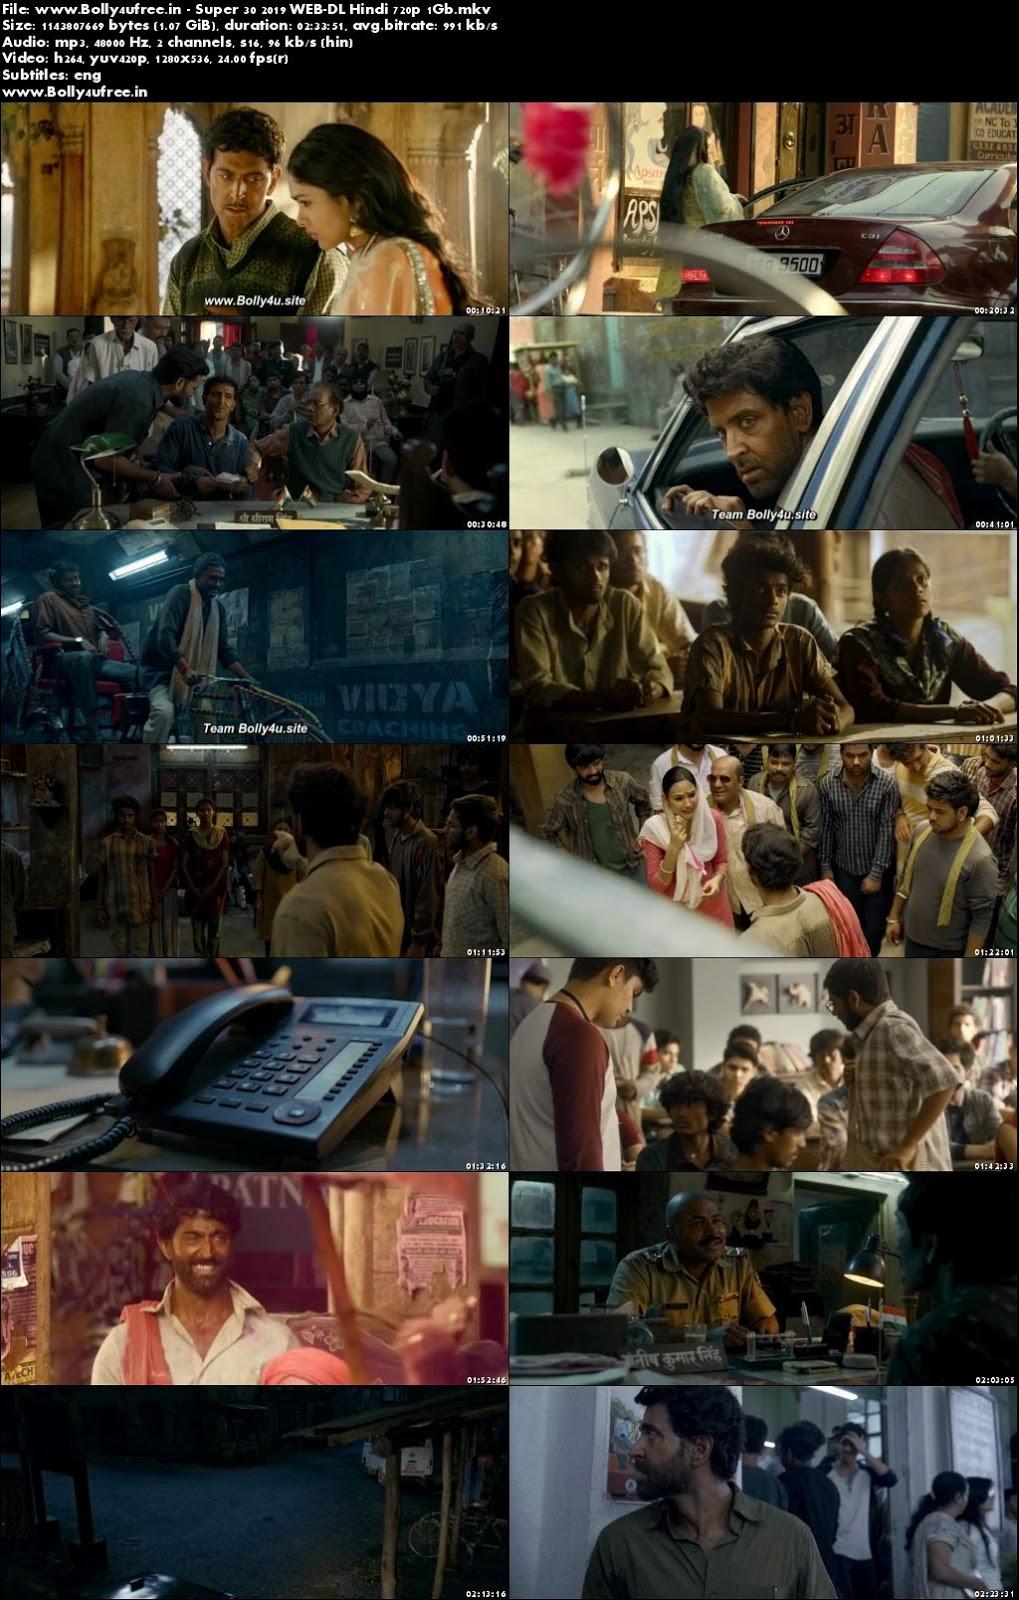 Super 30 2019 Hindi Full Movie Download WEB-DL 720p 1GB